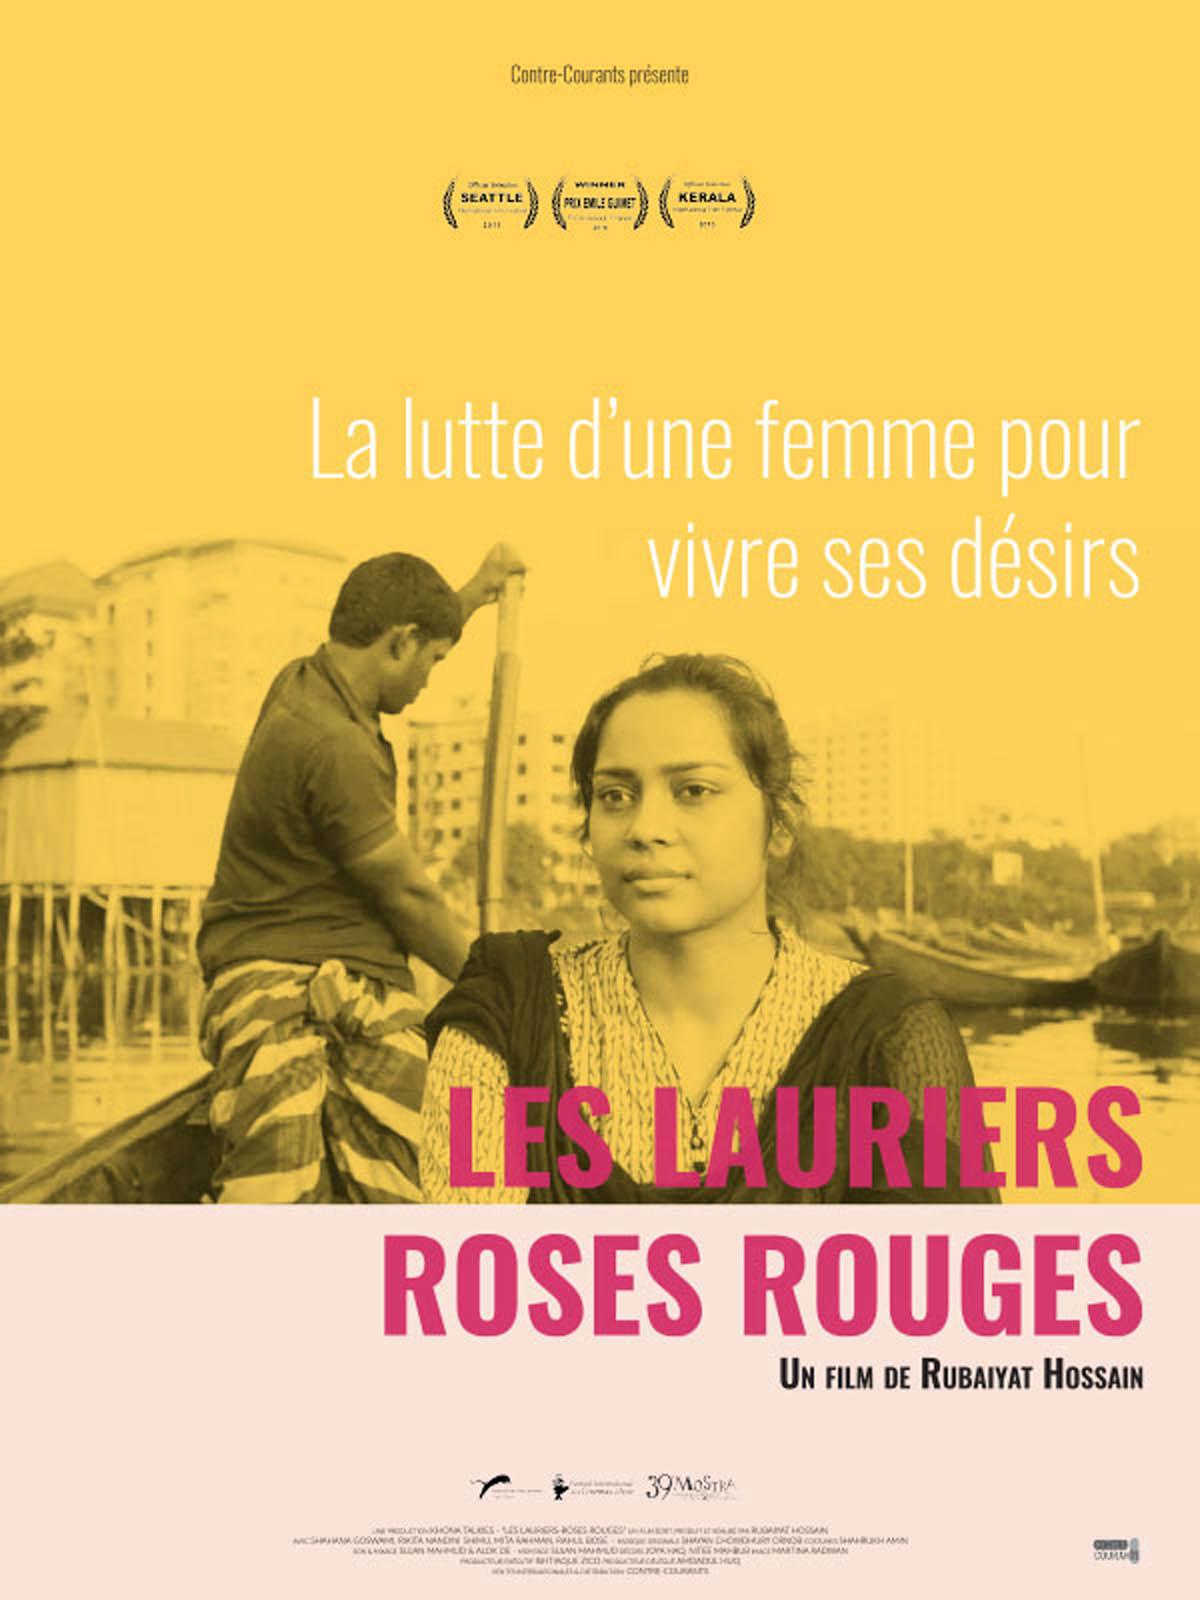 Les Lauriers-roses rouges